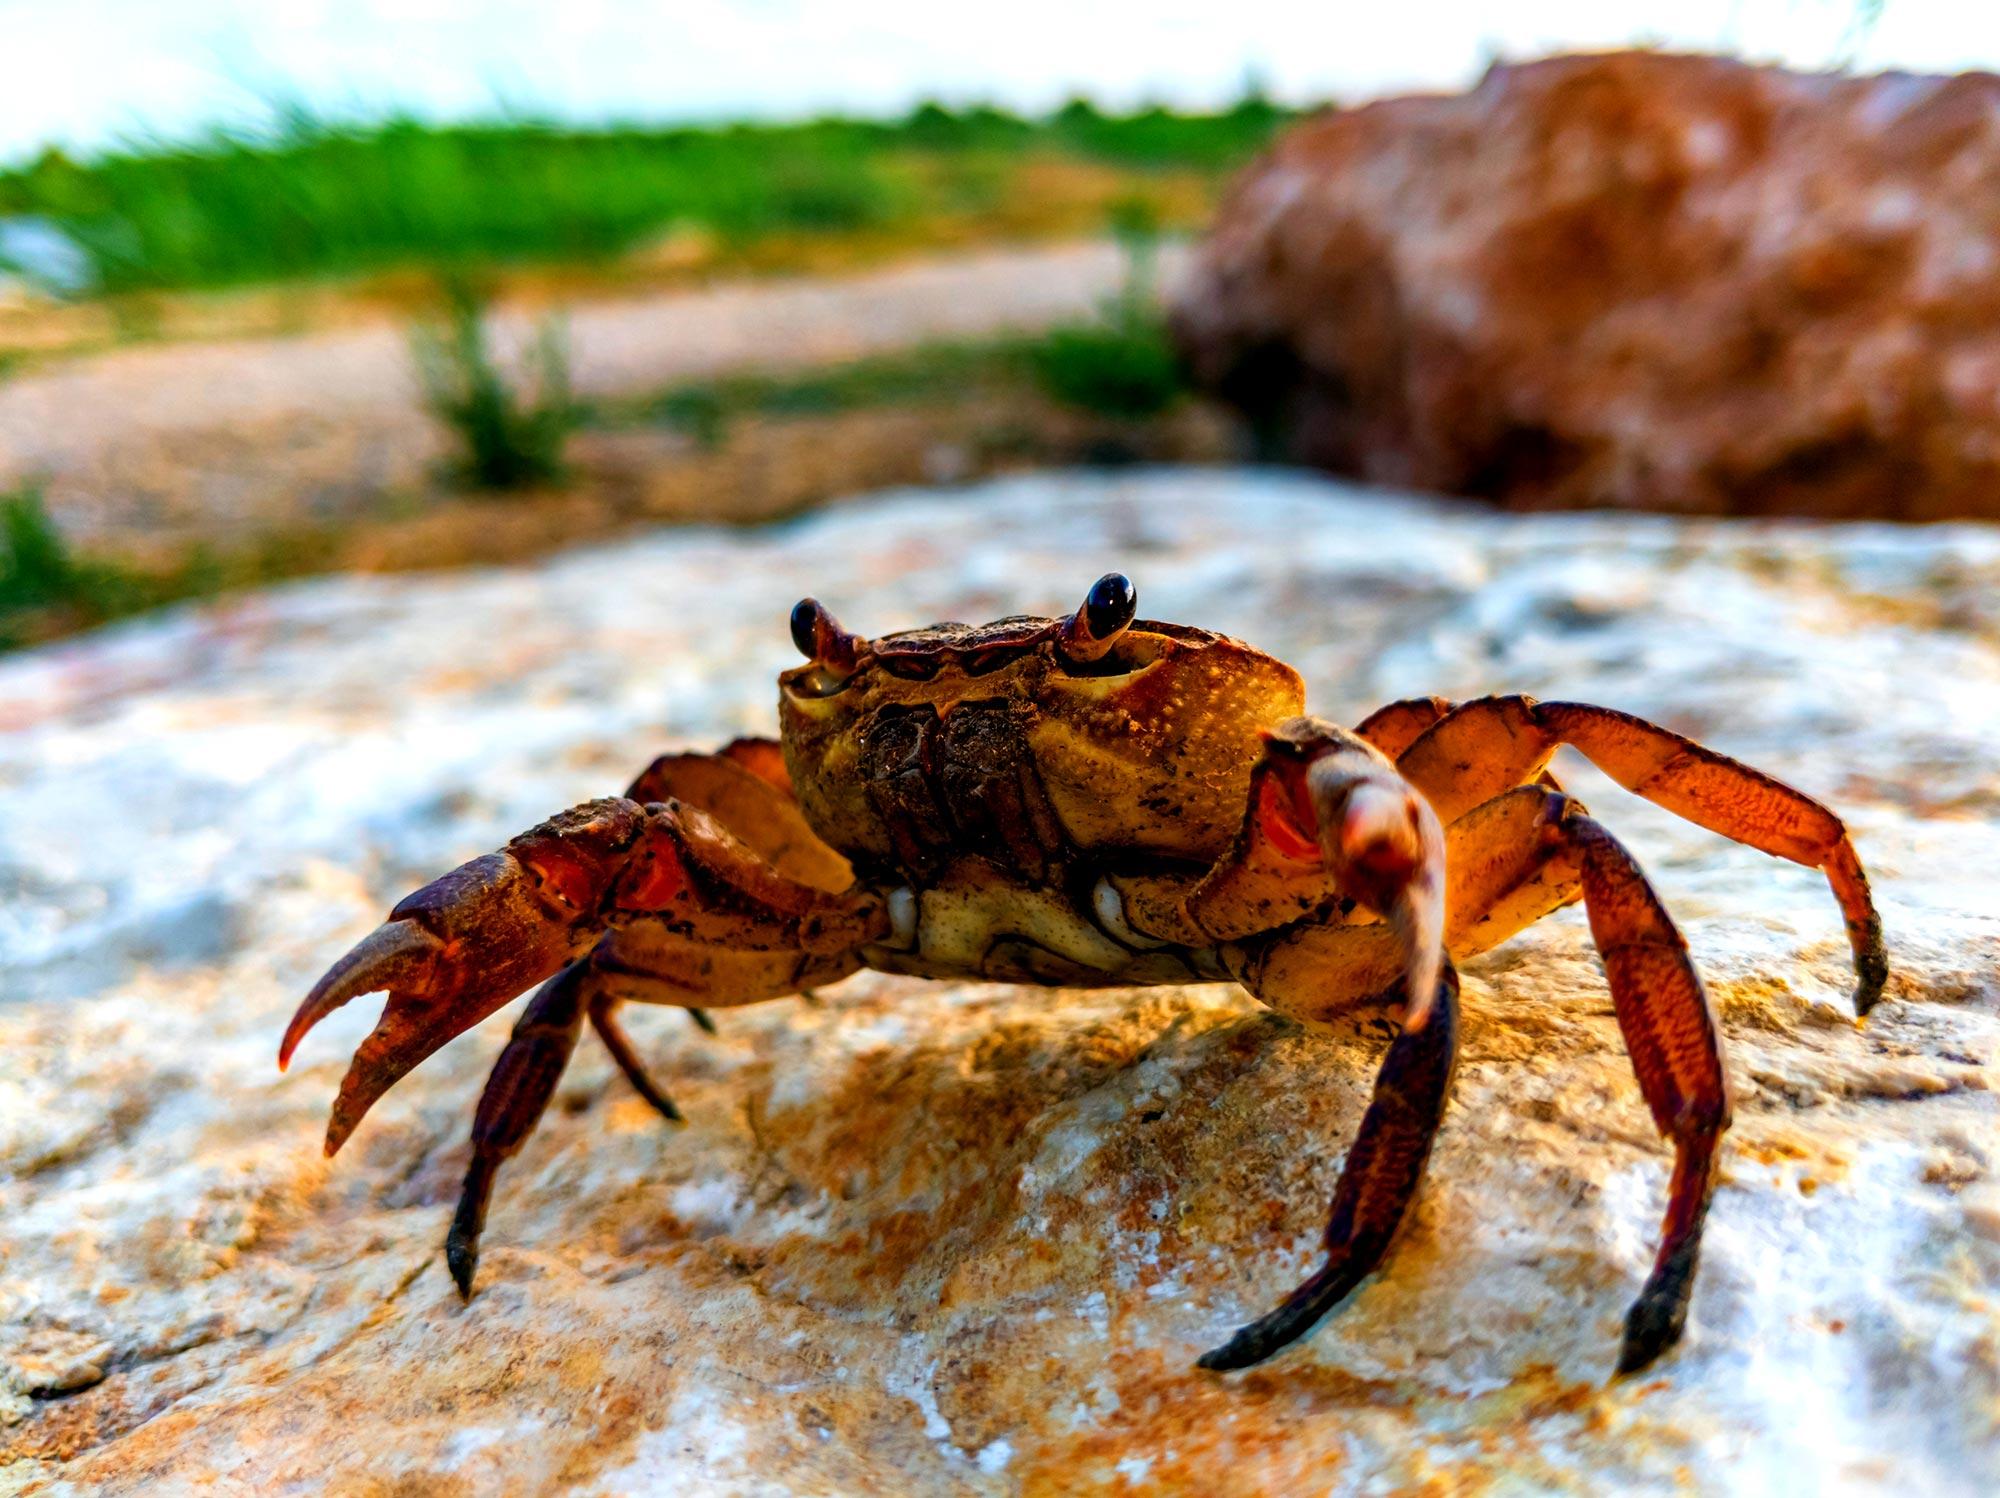 Israel's Shoreline Top Trails - Red Crab